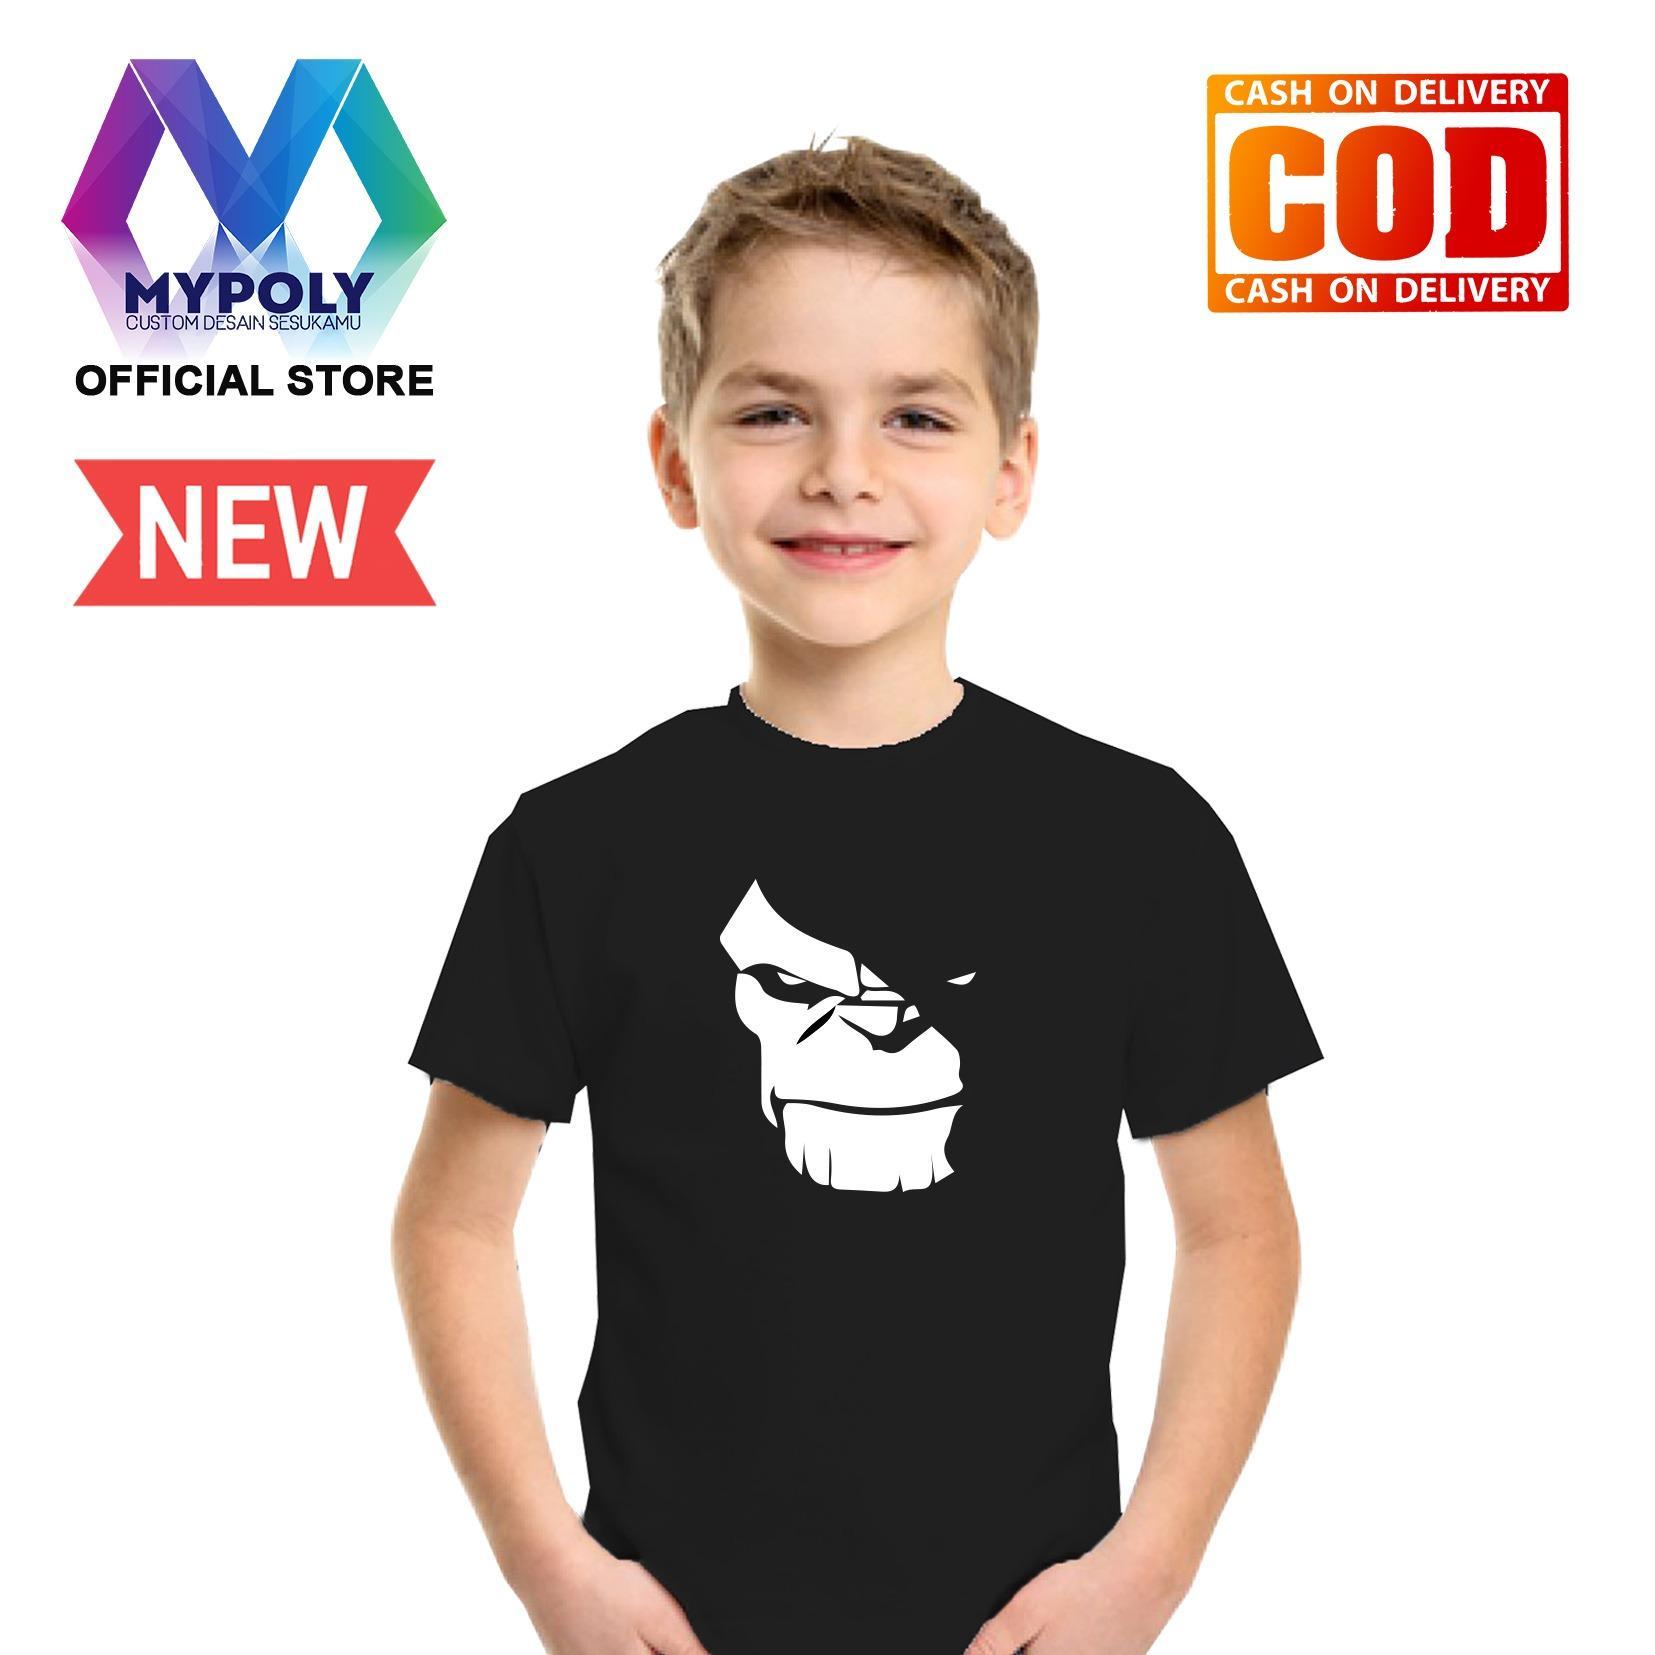 Kaos Premium Mypoly Anak Pria laki-laki AP / Baju Couple Family Keluarga / Tshirt distro / Fashion atasan / Kaos Anime / Kaos Animasi / Kaos Super Hero / Kaos Kartun / Kaos Cartoon / Kaos Lucu / Kaos Gambar Karakter / Kaos Anak Thanos Silhouette